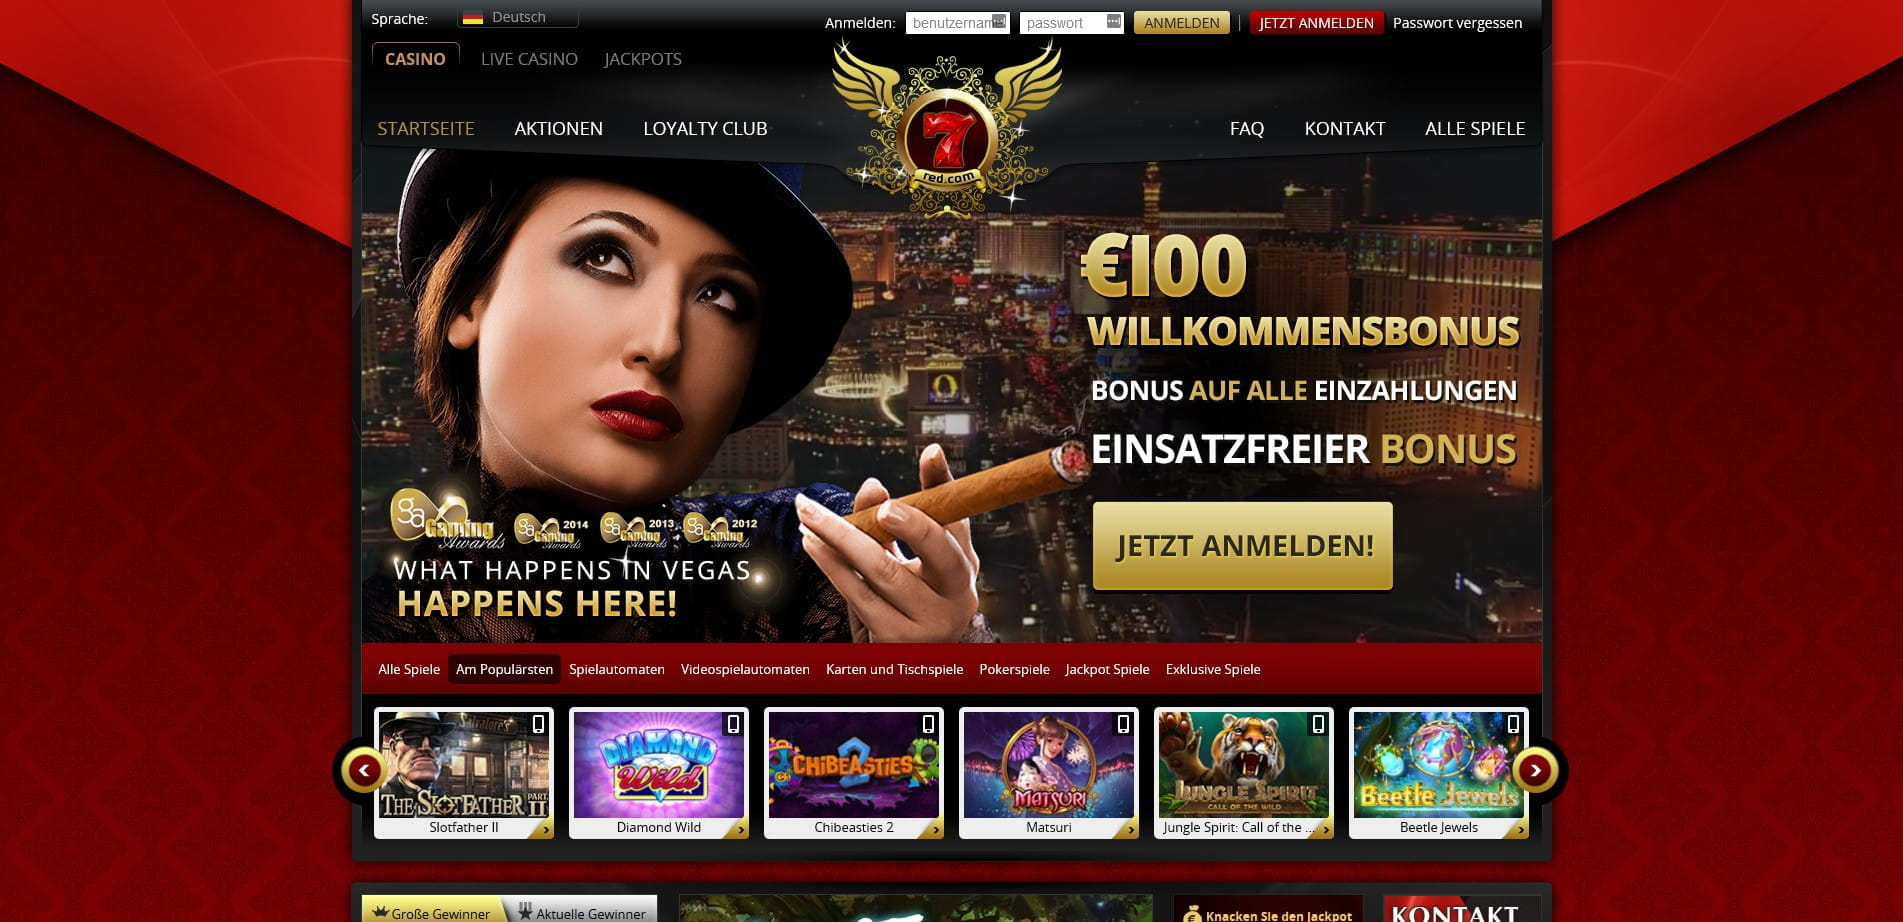 7red casino bonus koder